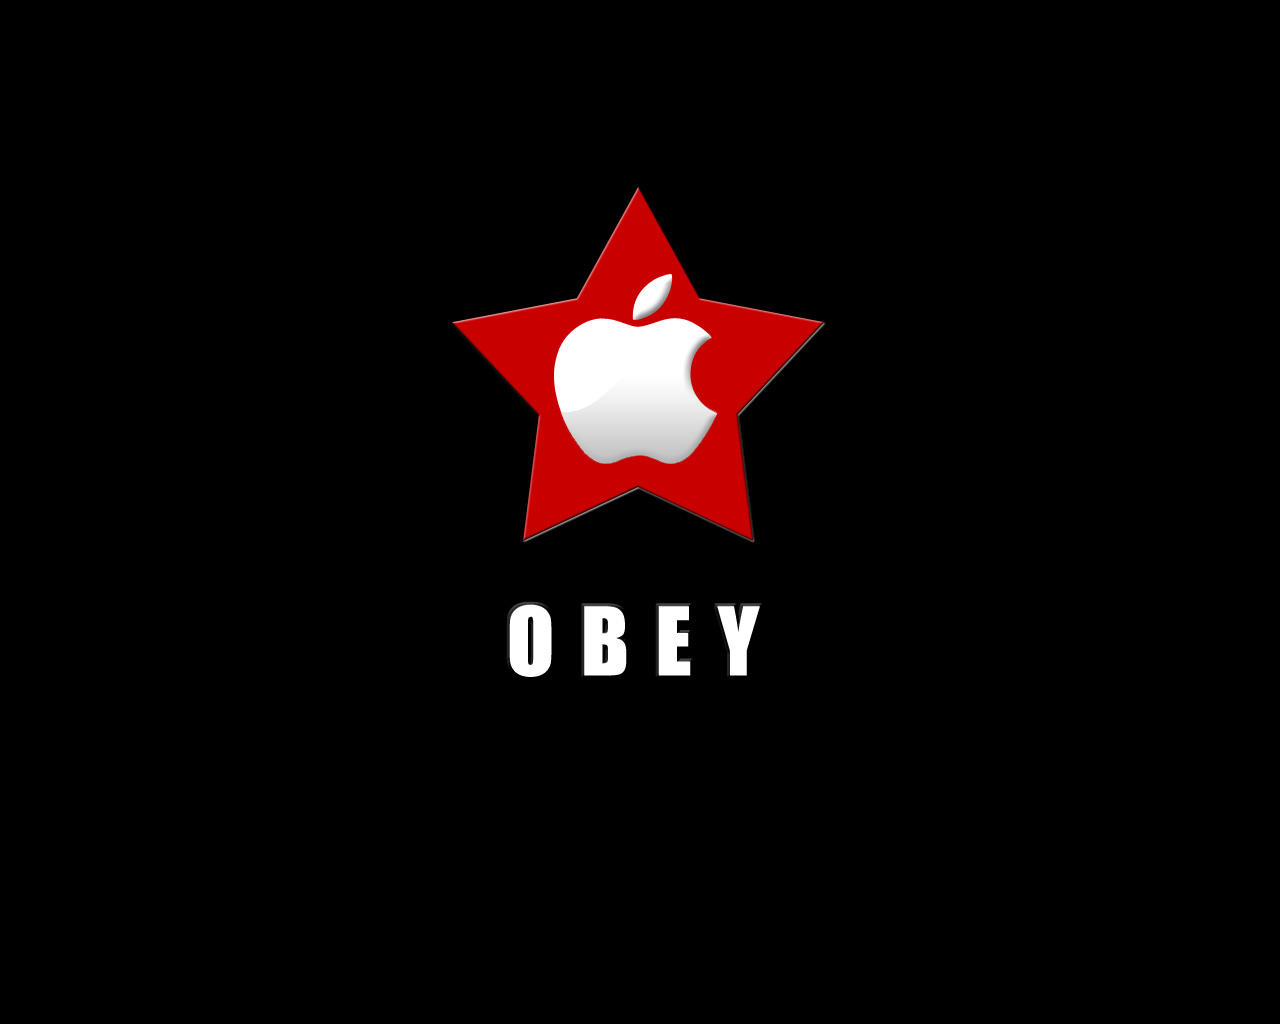 Obey wallpaper - Wallpaper Bit